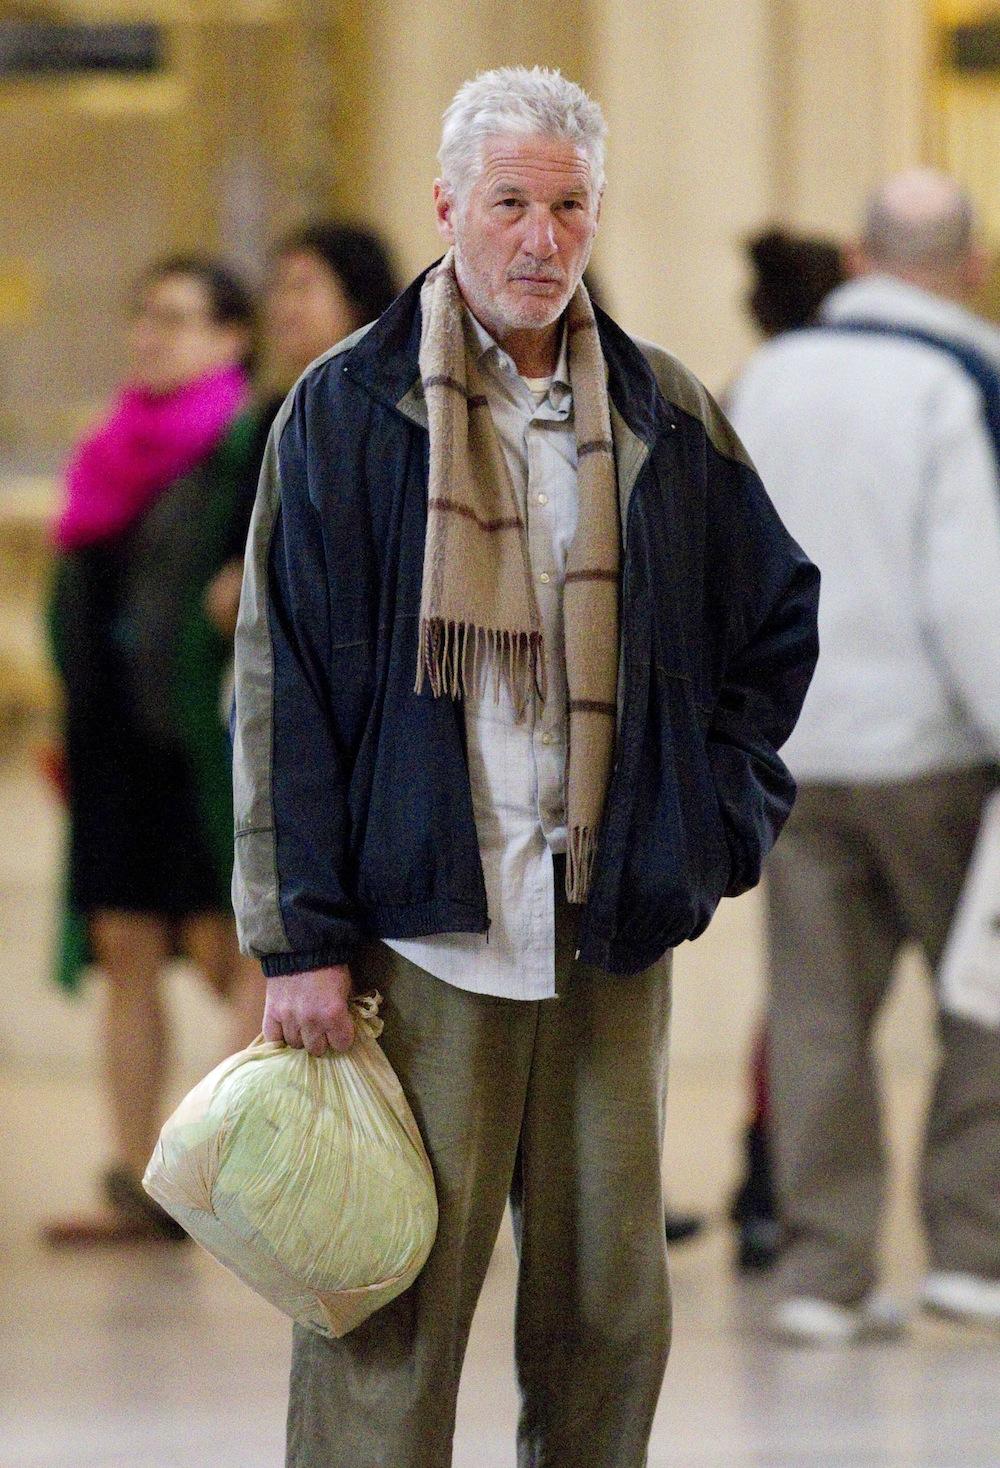 richard-gere-homeless-man